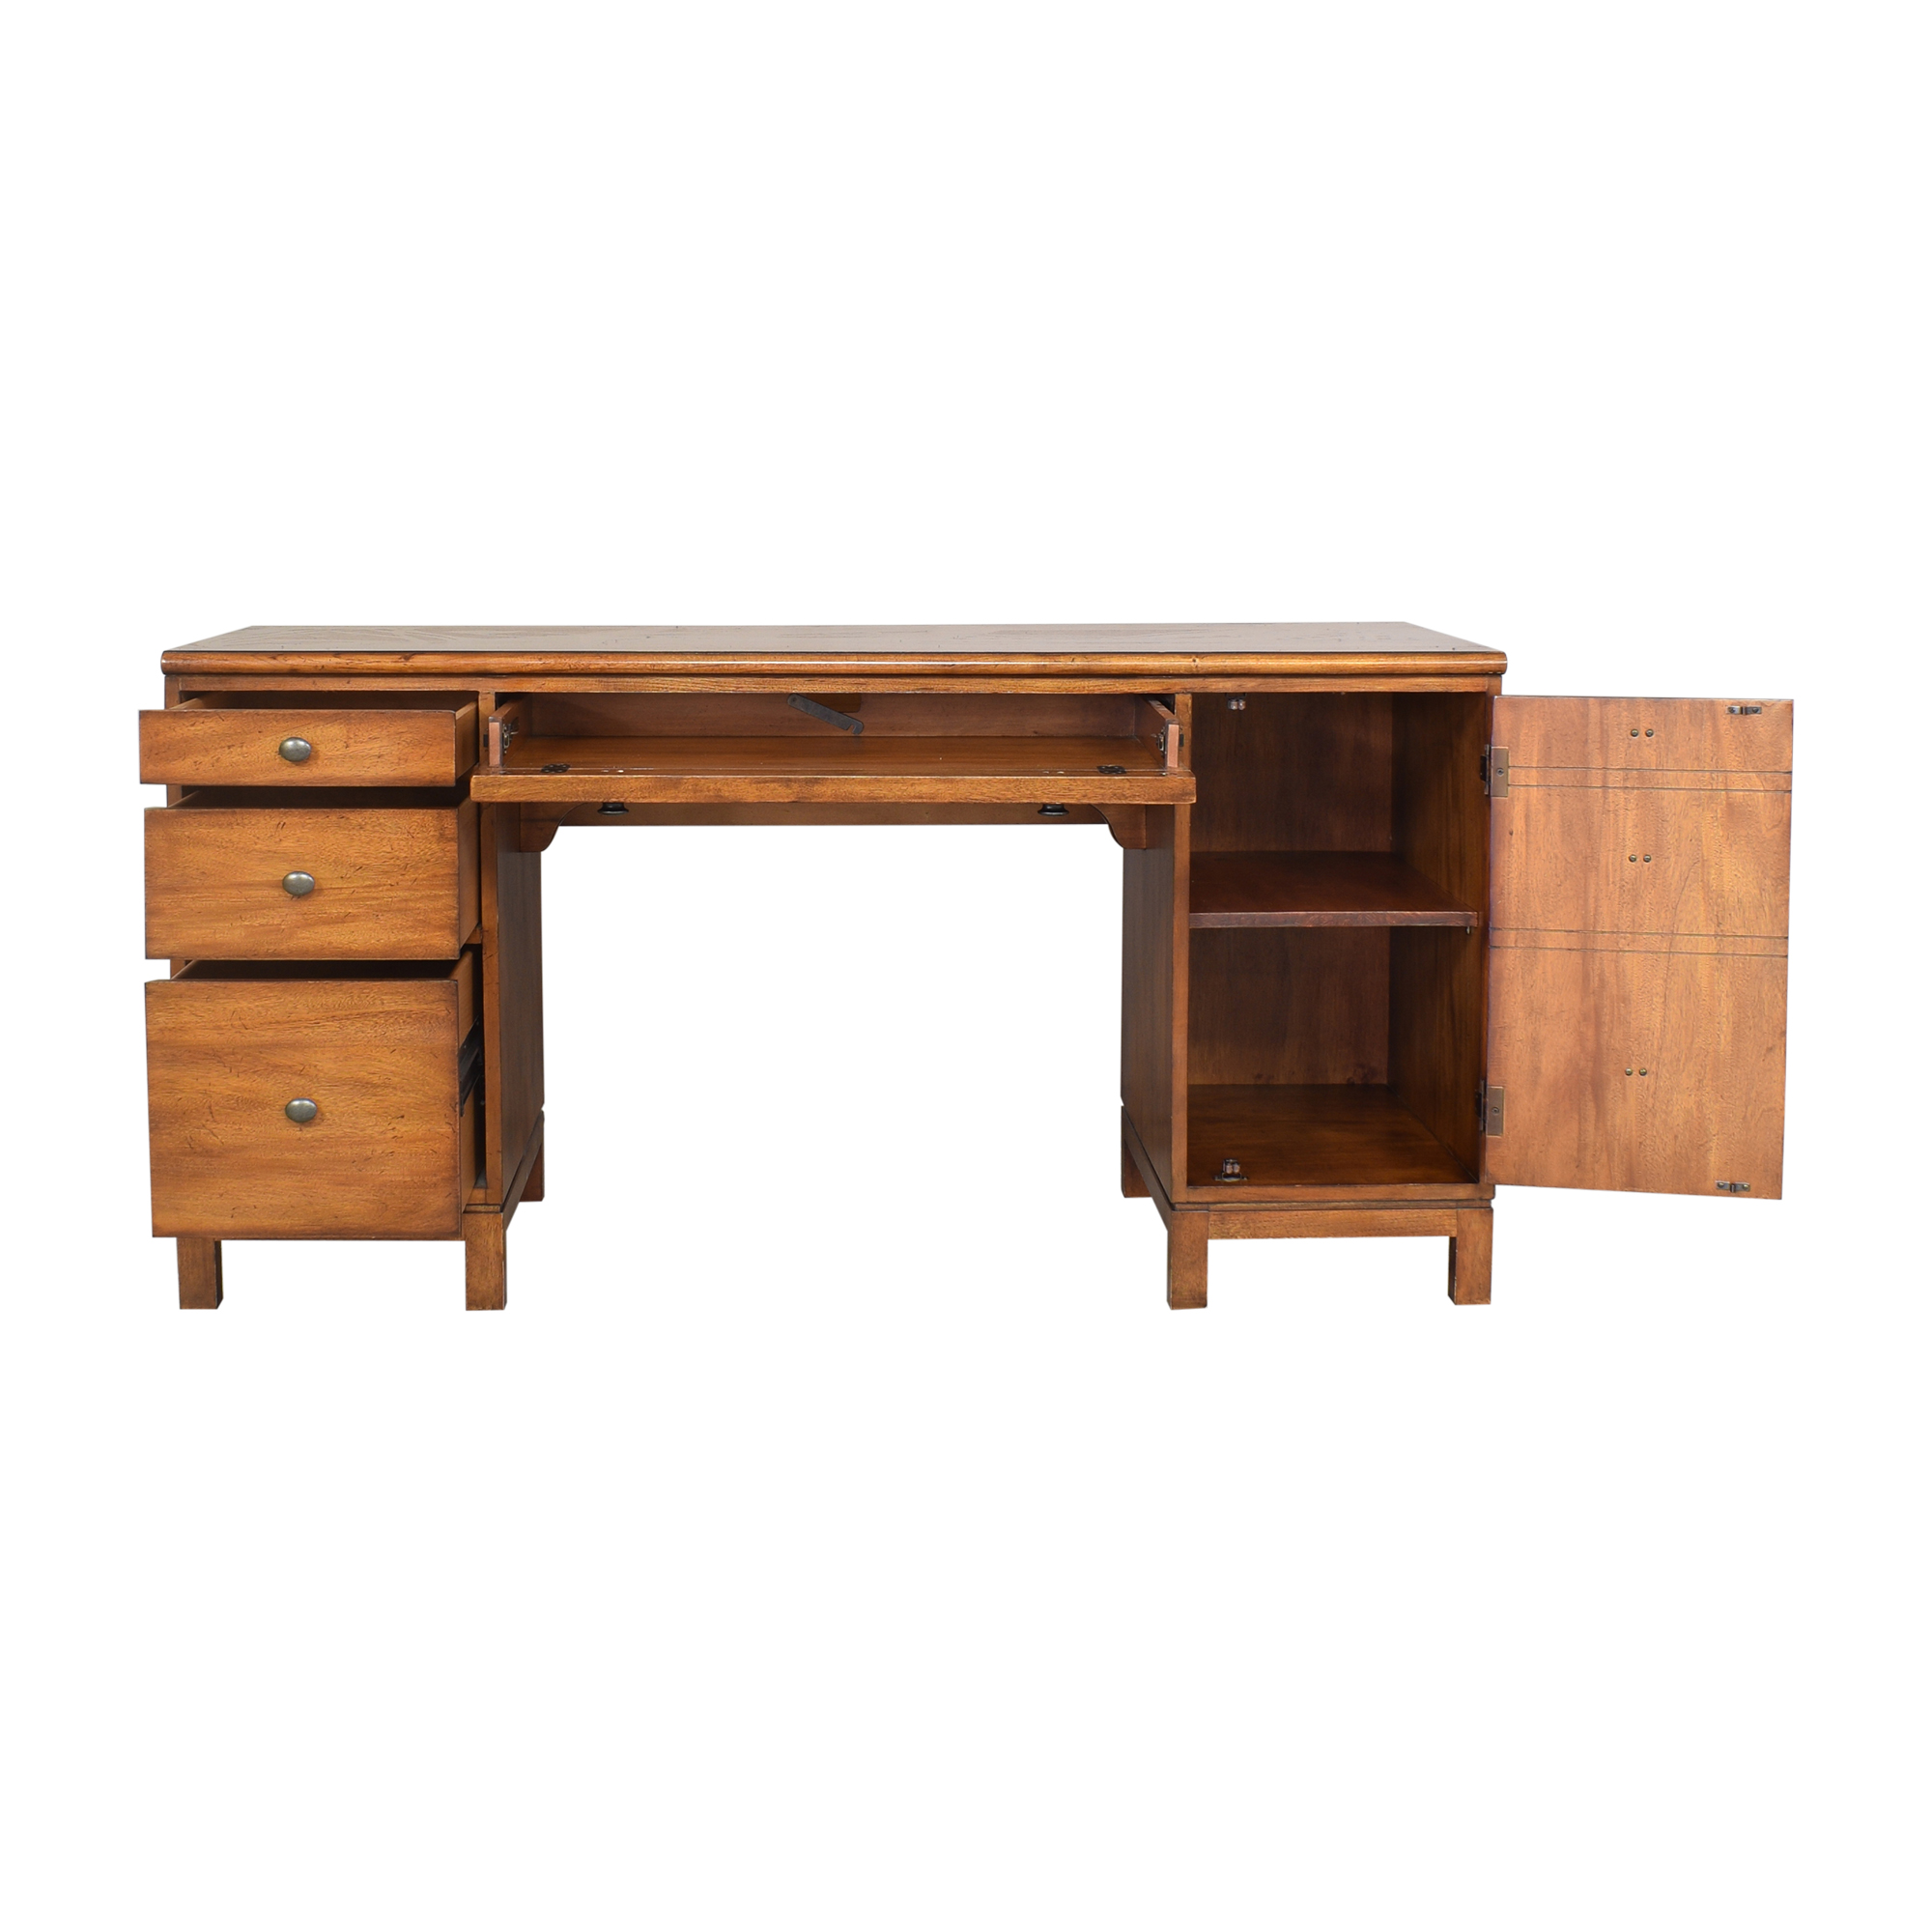 Ethan Allen Ethan Allen Hawke Double Pedestal Desk brown